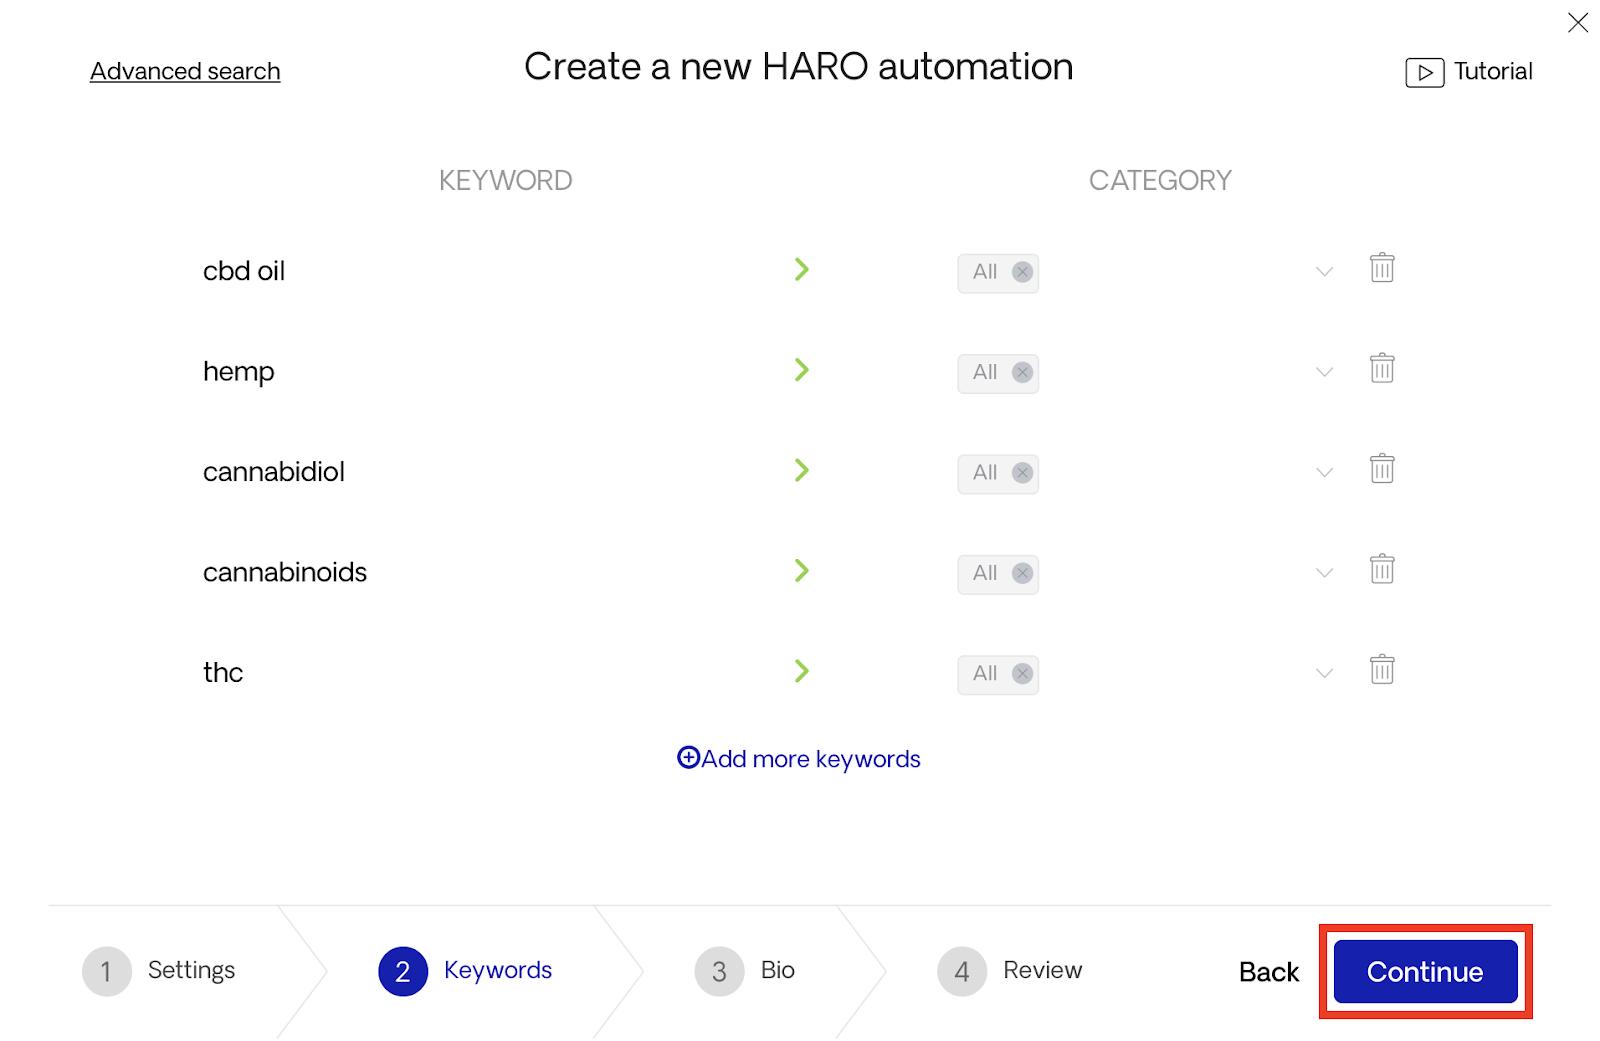 Continuing HARO automation setup 2